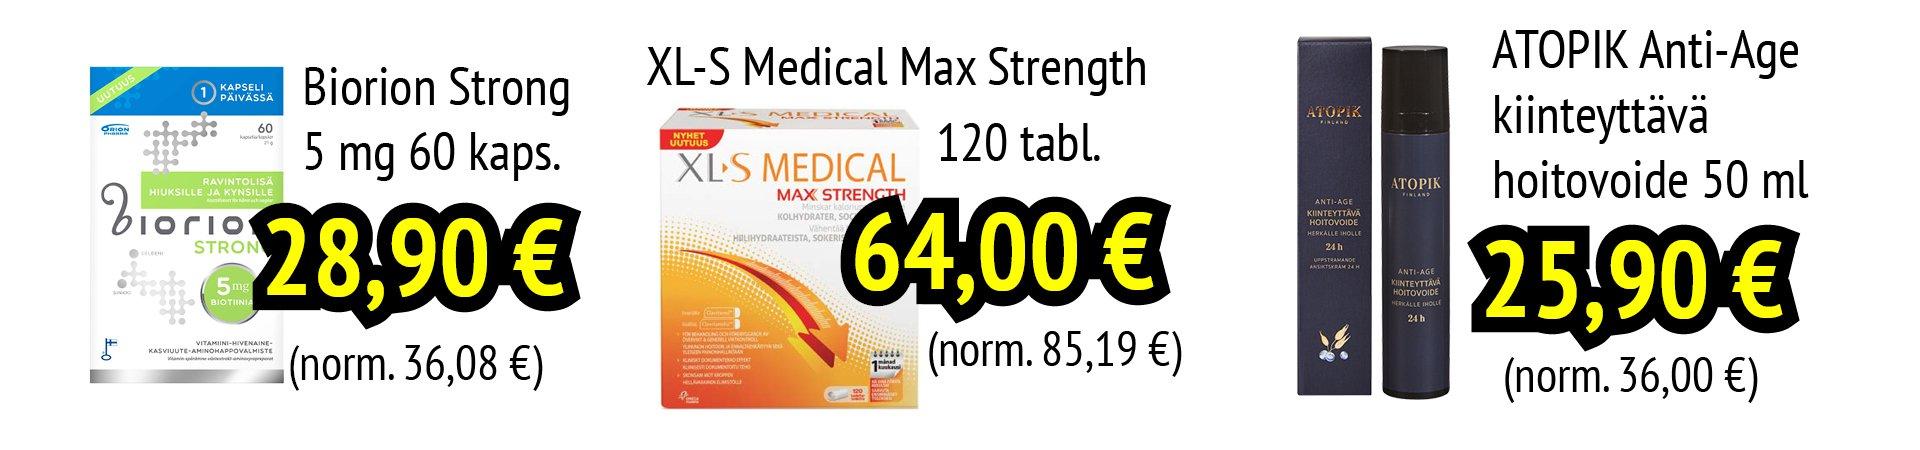 verkkoapteekki xl-s medical tarjous